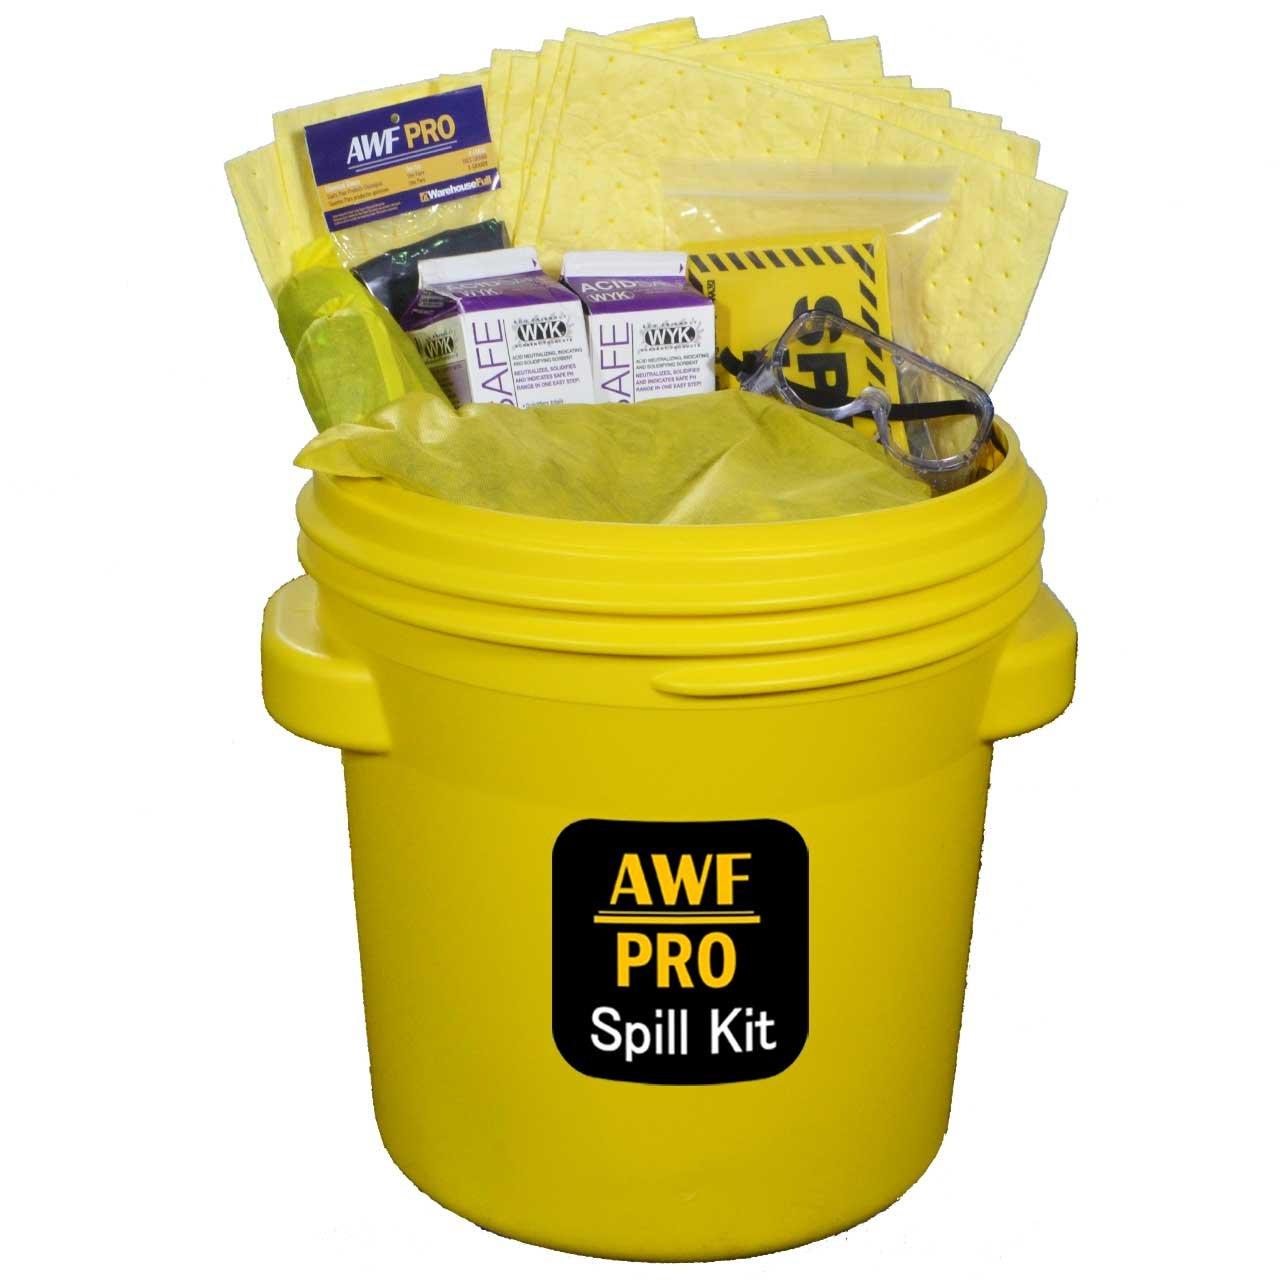 "20 Gallon Battery Acid Spill Kit DOT Overpack Drum, 4 lb Acid Neutralizer, 40 Pads 15""x19"", 3 Socks 3""x4', 3 Pillows 18""x18"", Chemical Gloves, 3 Hazmat Bags, Safety Goggles, Spill Kit Sign"